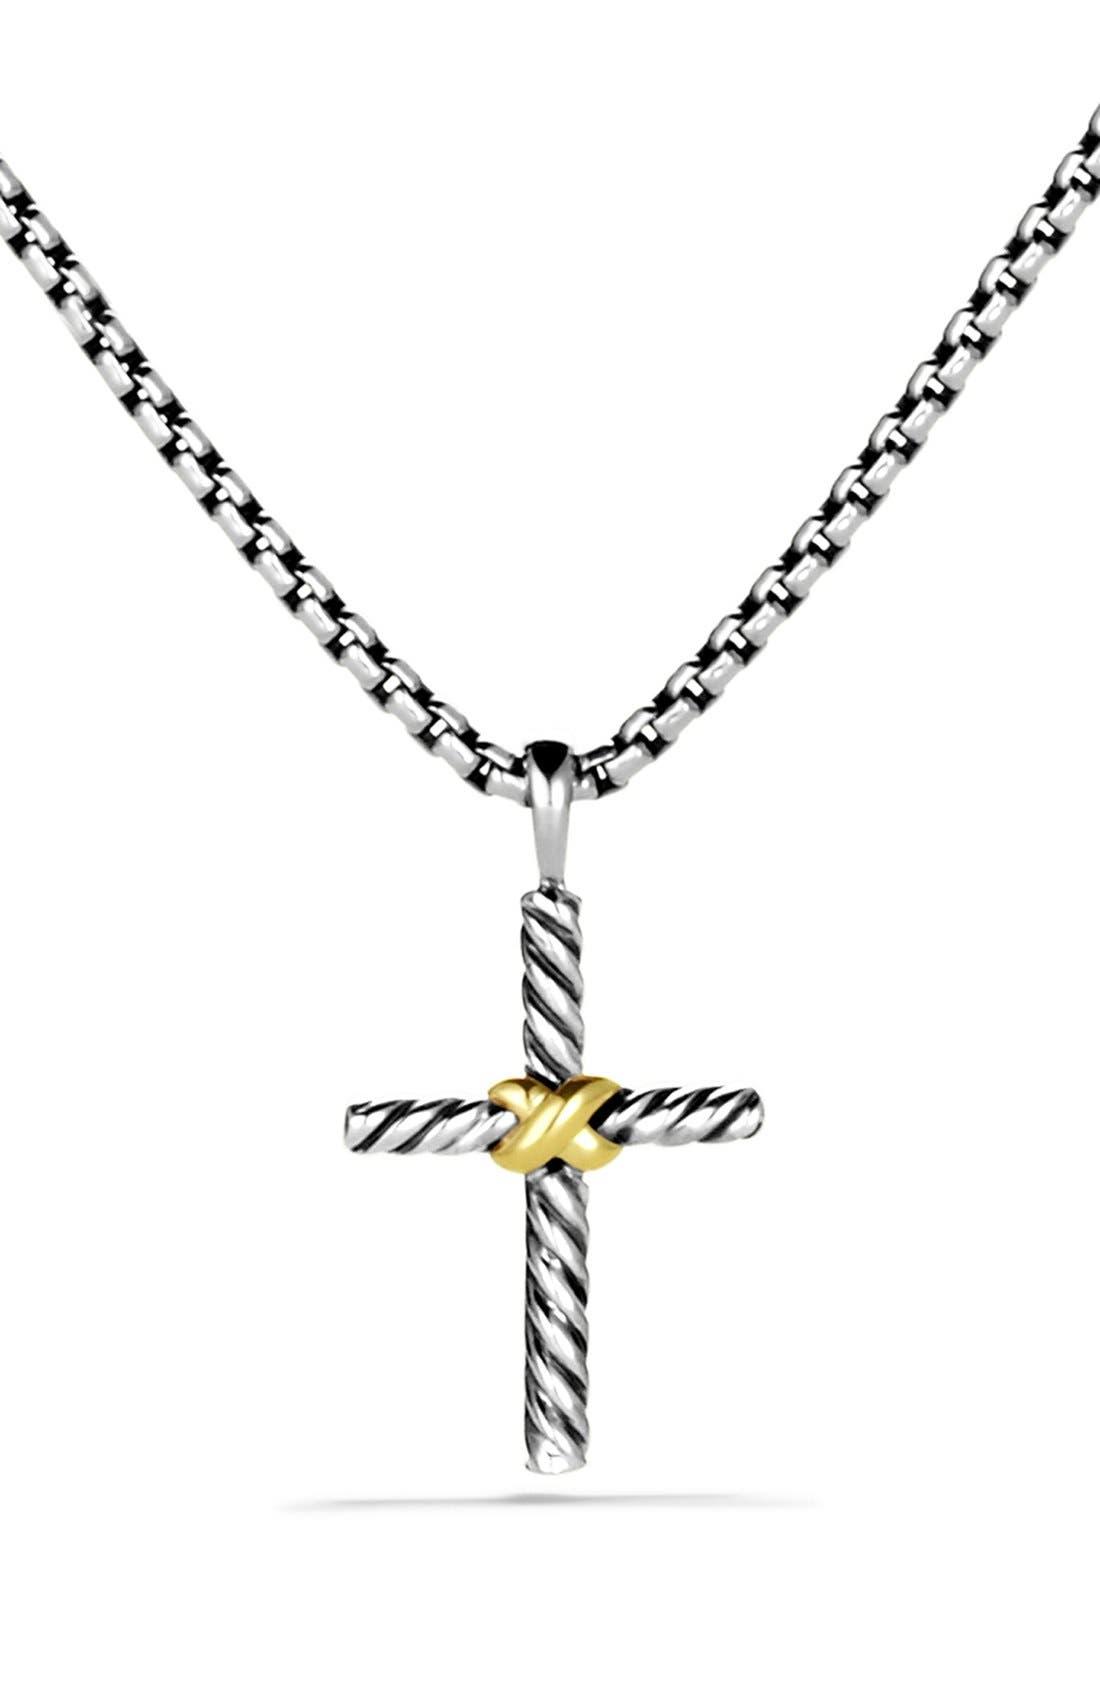 Main Image - David Yurman 'X' Cross with Gold on Chain